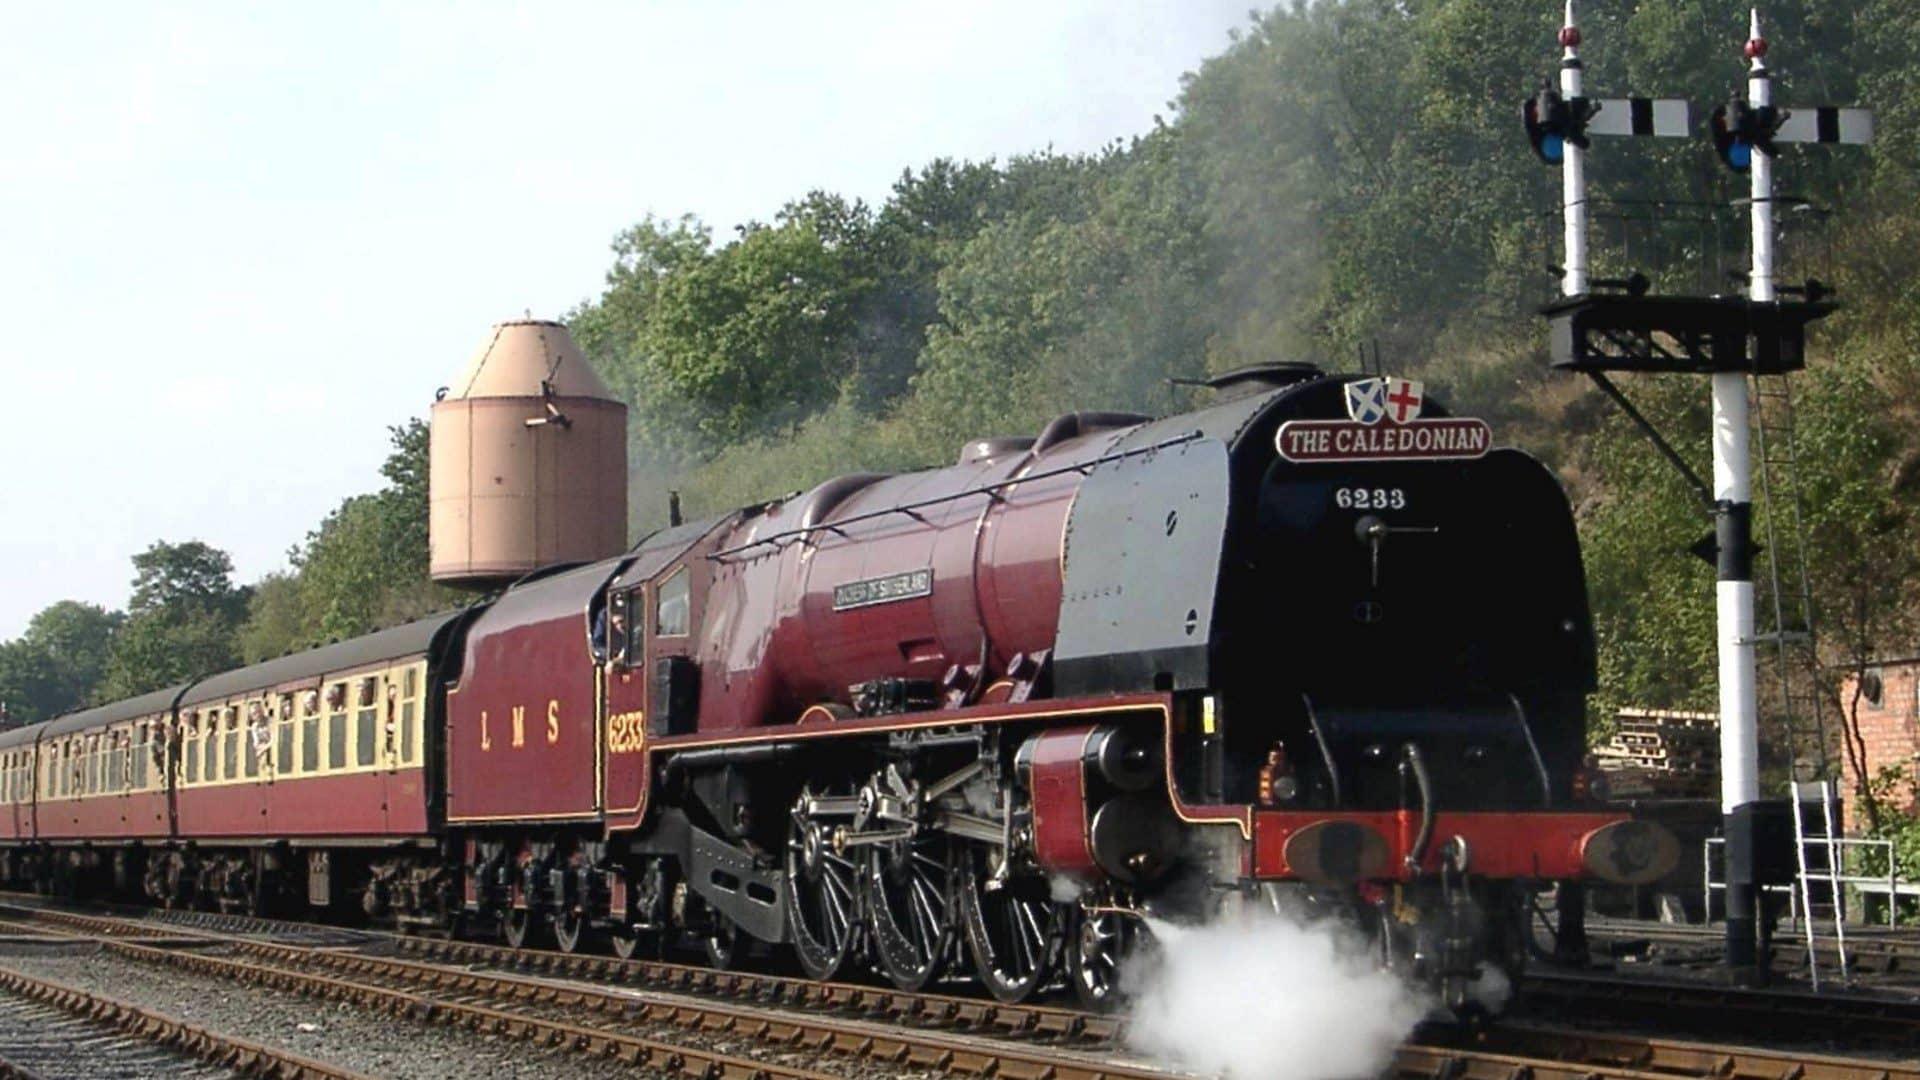 6233 Duchess of Sunderland on the Severn Valley Railway // Credit Severn Valley Railway